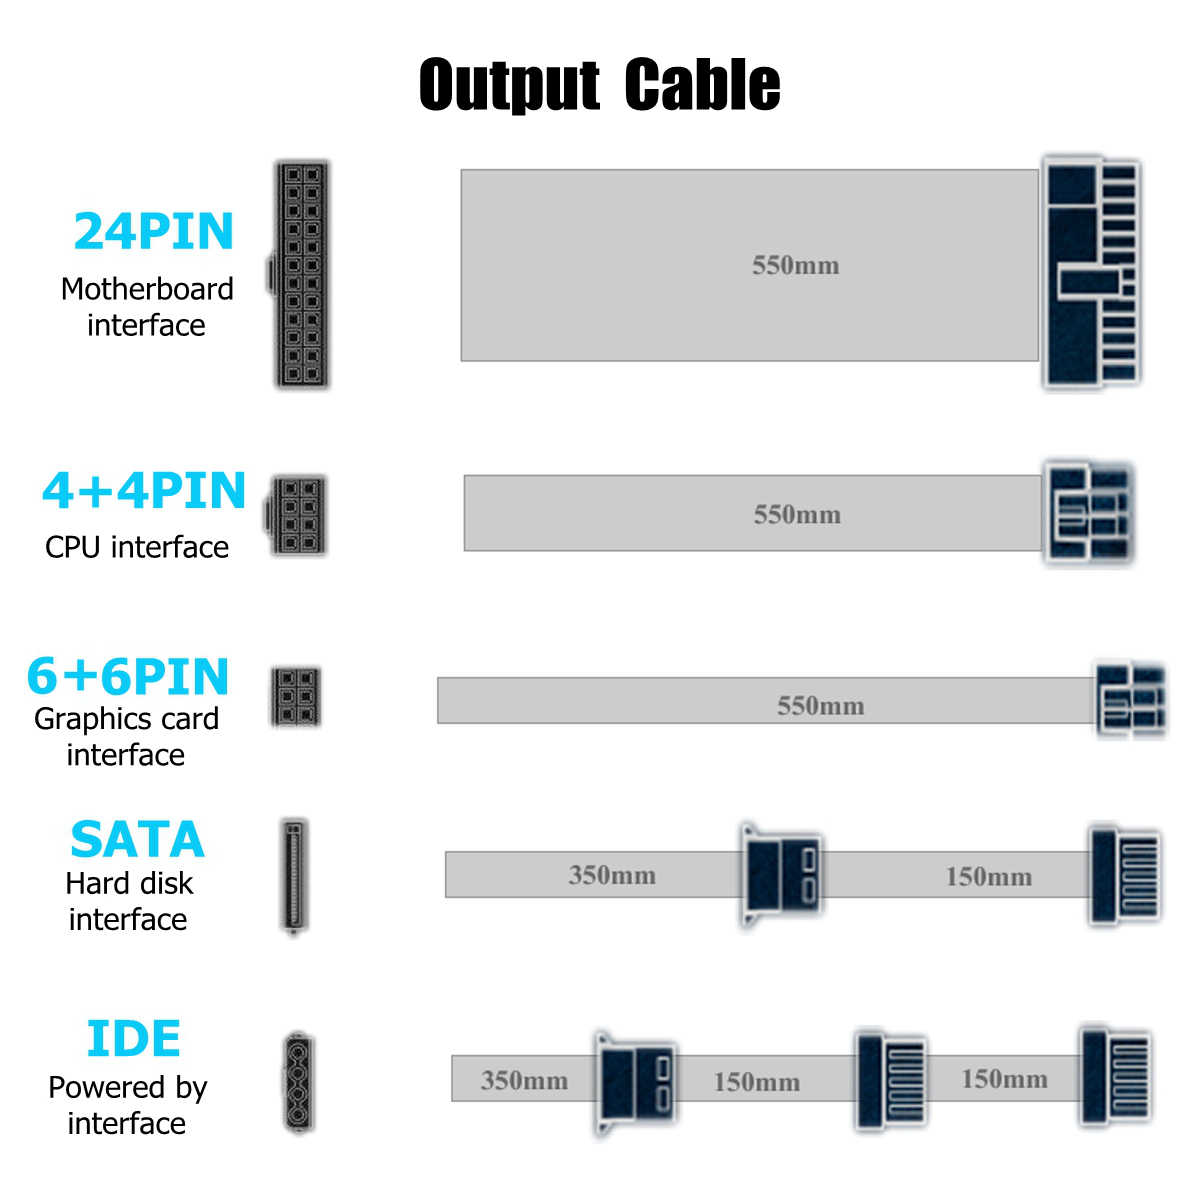 AU/EU/Us-stecker MAX 700W PCI SATA ATX 12V Gaming PC Netzteil 24Pin/ molex/Sata 700Walt 12CM Lüfter Computer Netzteil Für BTC